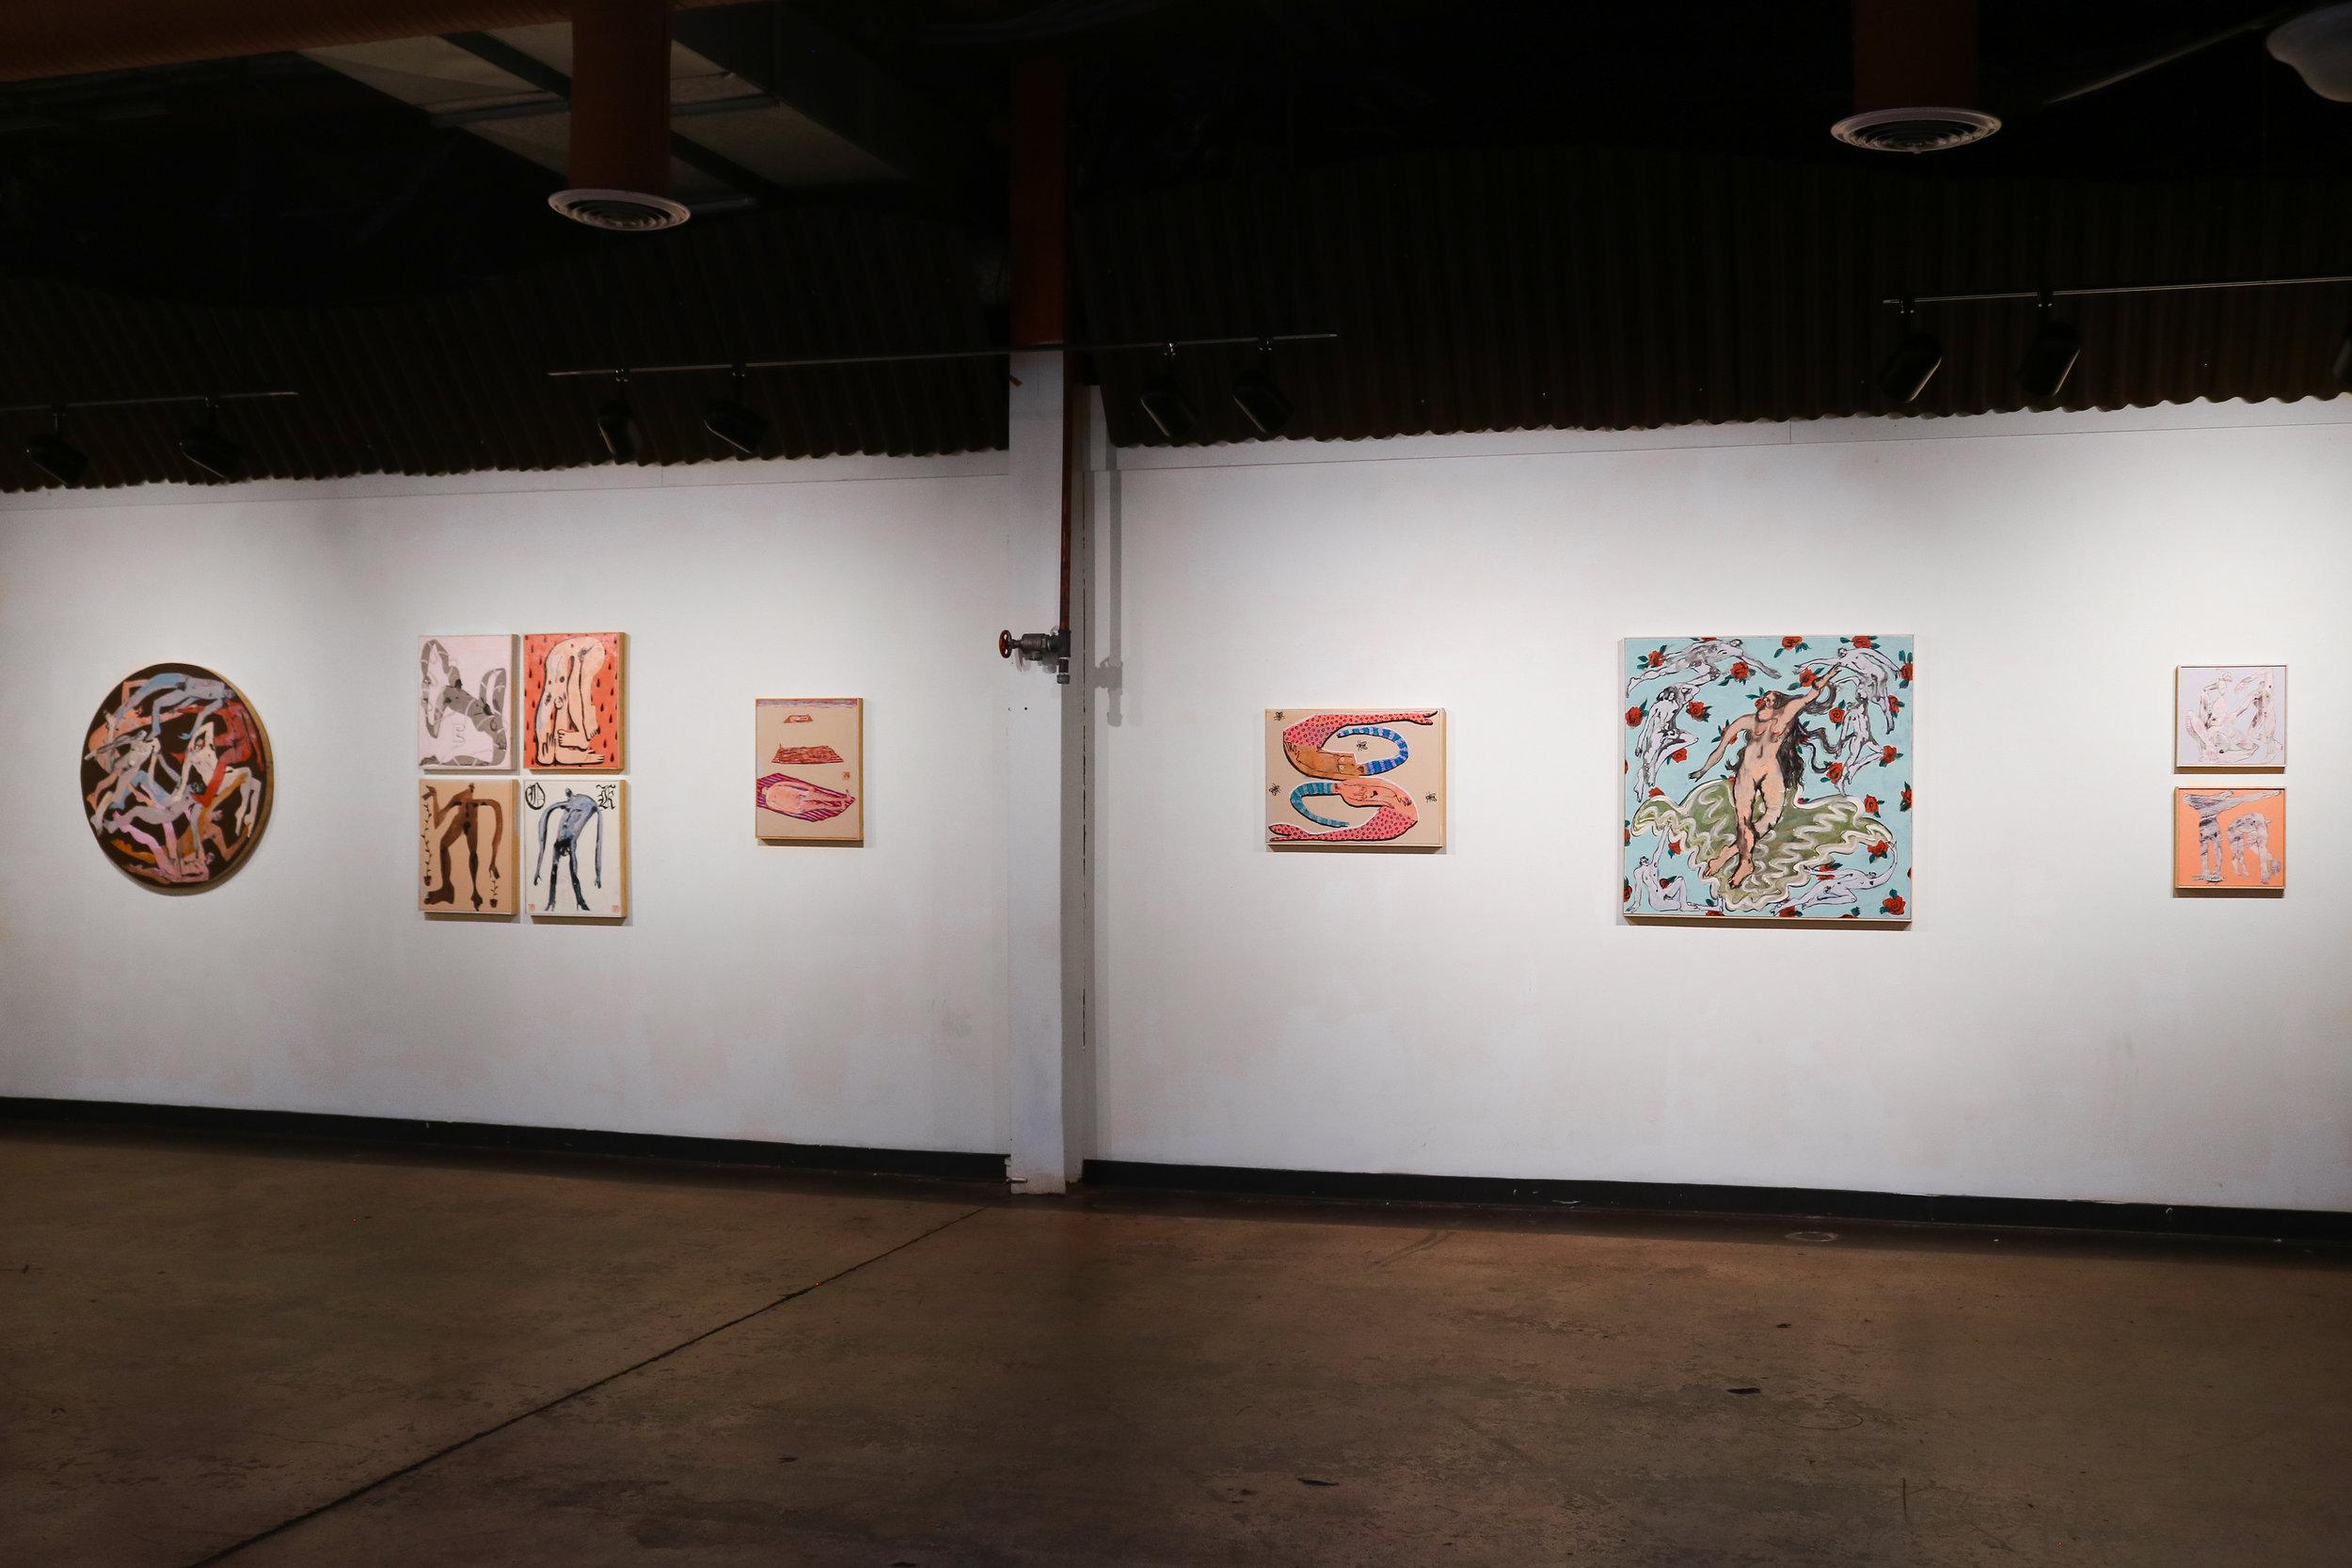 (far left wall of Art Works Inc. gallery)